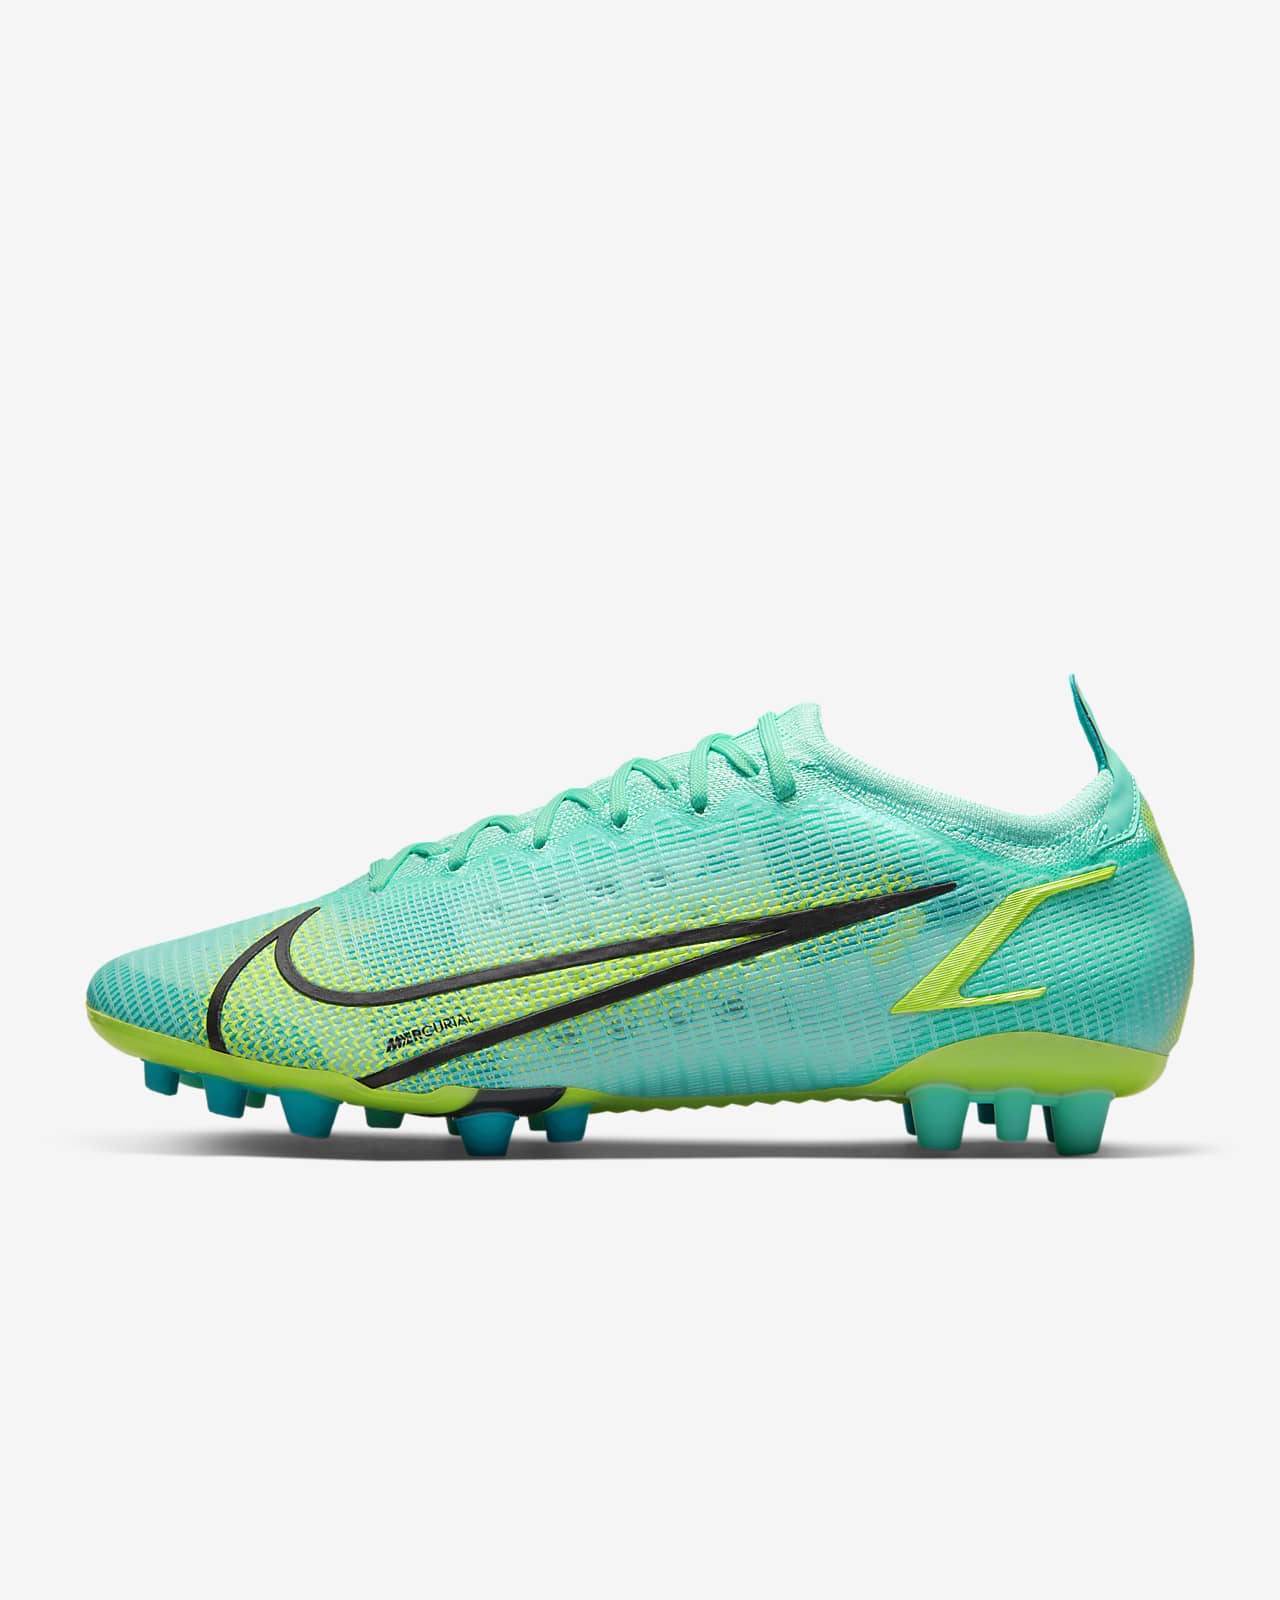 Nike Mercurial Vapor 14 Elite AG Voetbalschoen (kunstgras)